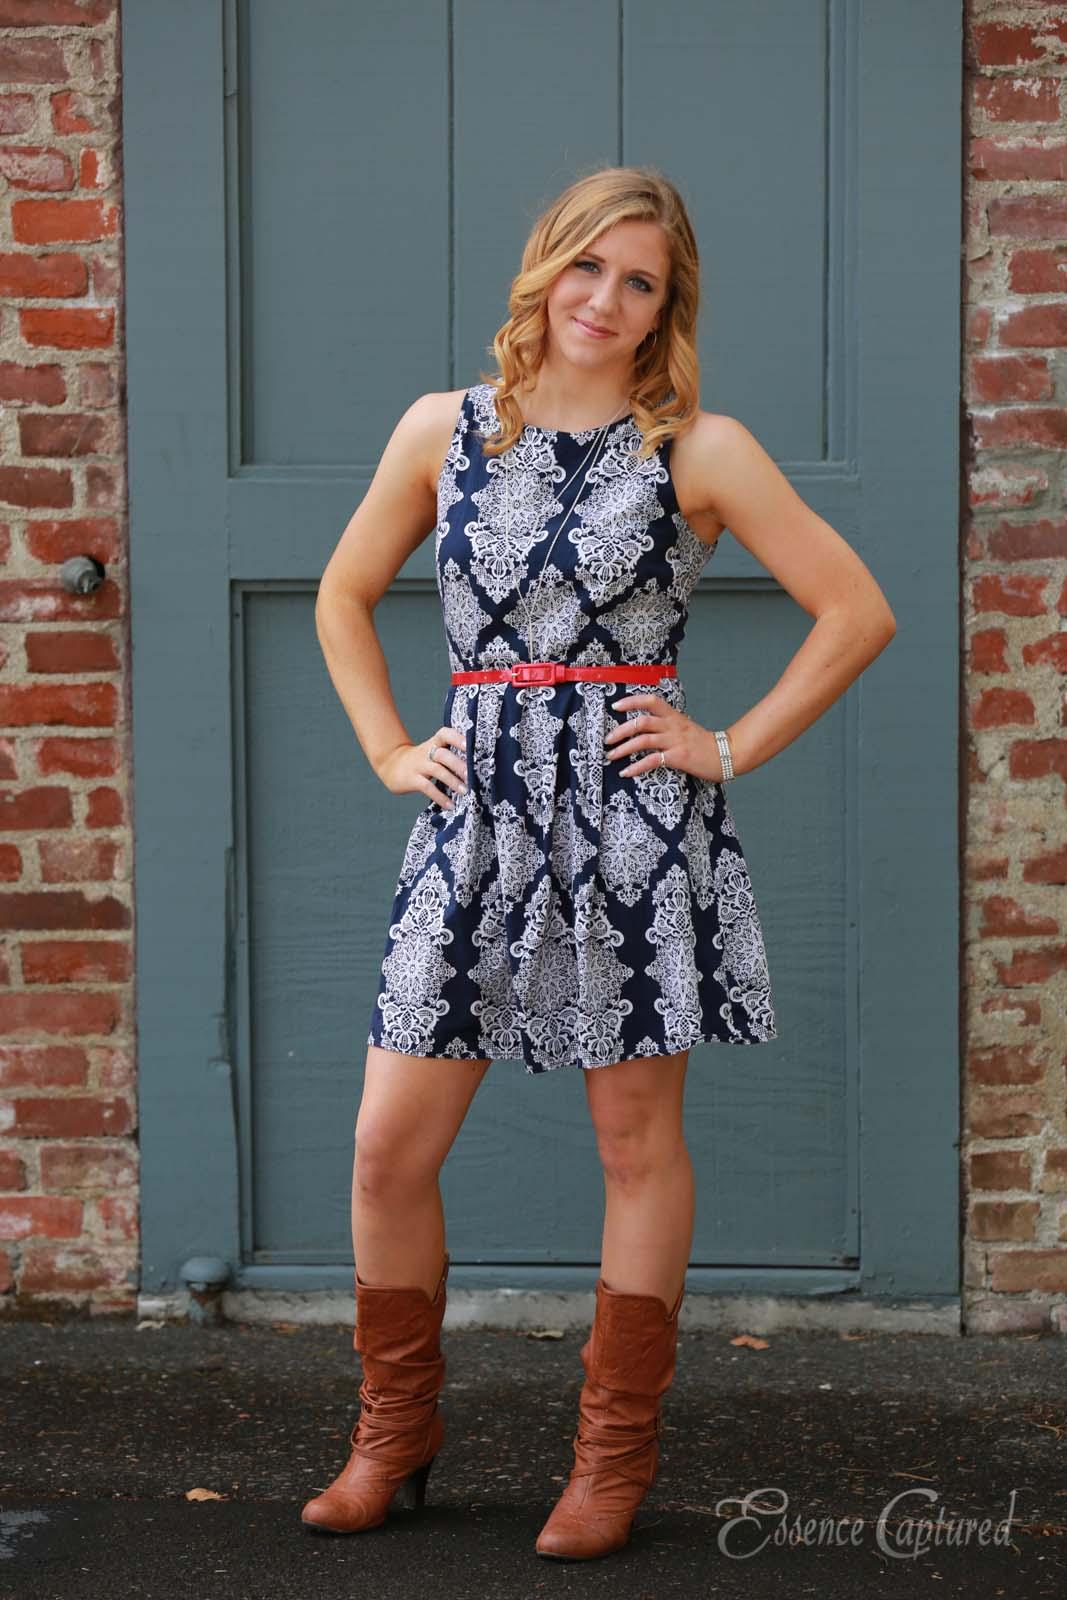 female high school senior portrait blue print dress long blonde hair hands on hips